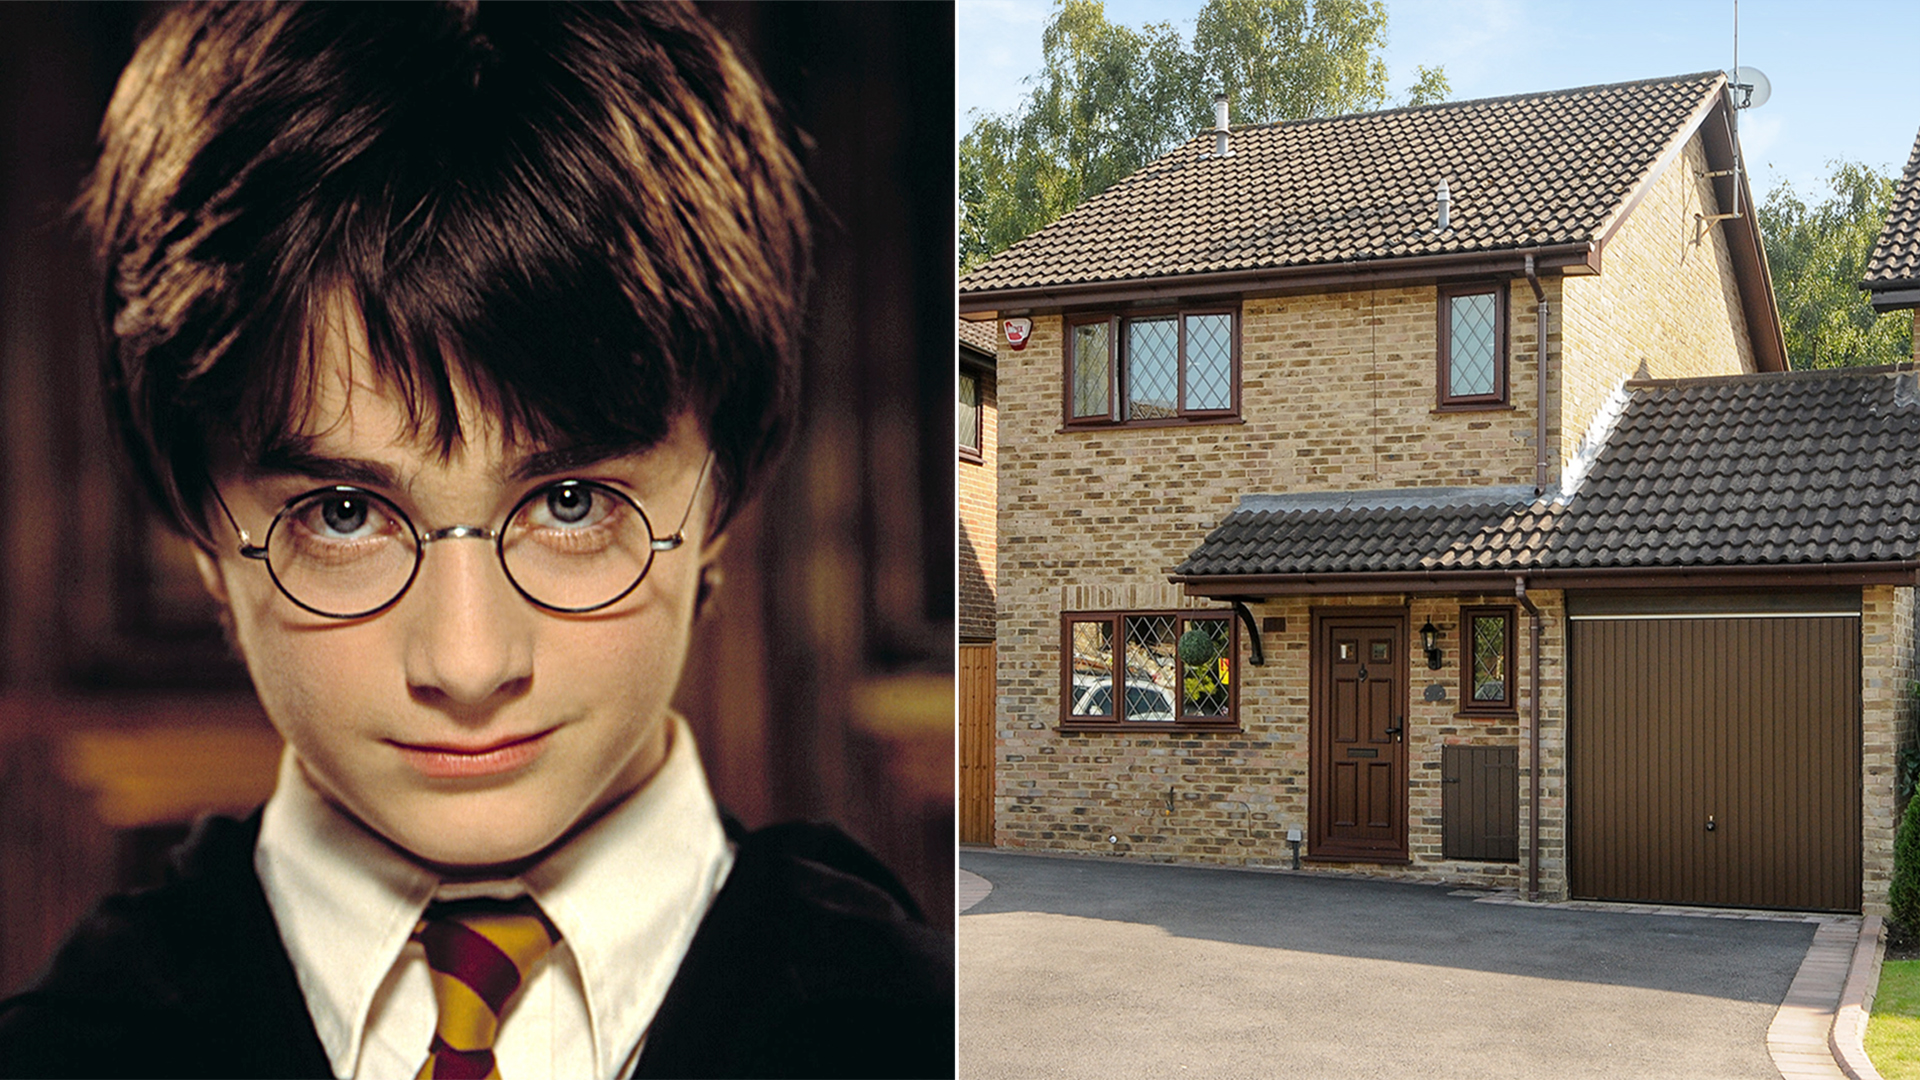 Amazing Wallpaper Harry Potter Childhood - harry-potter-home-today-160920-tease_3e0a800219d18b06526c73f1cd14984d  Trends_234865.jpg